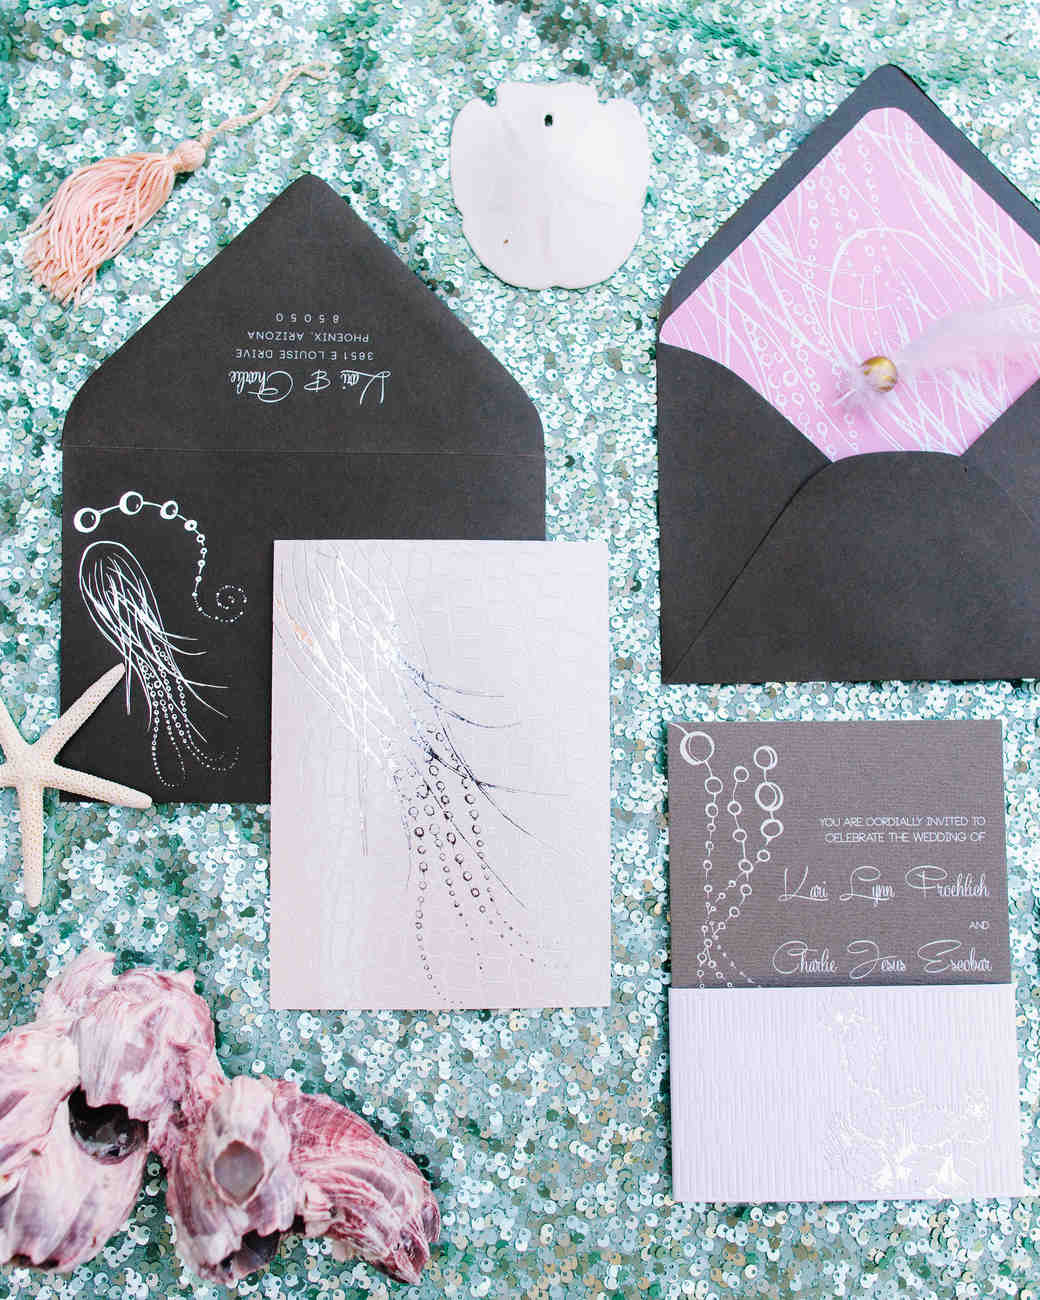 kari-charlie-wedding-invite-0314.jpg